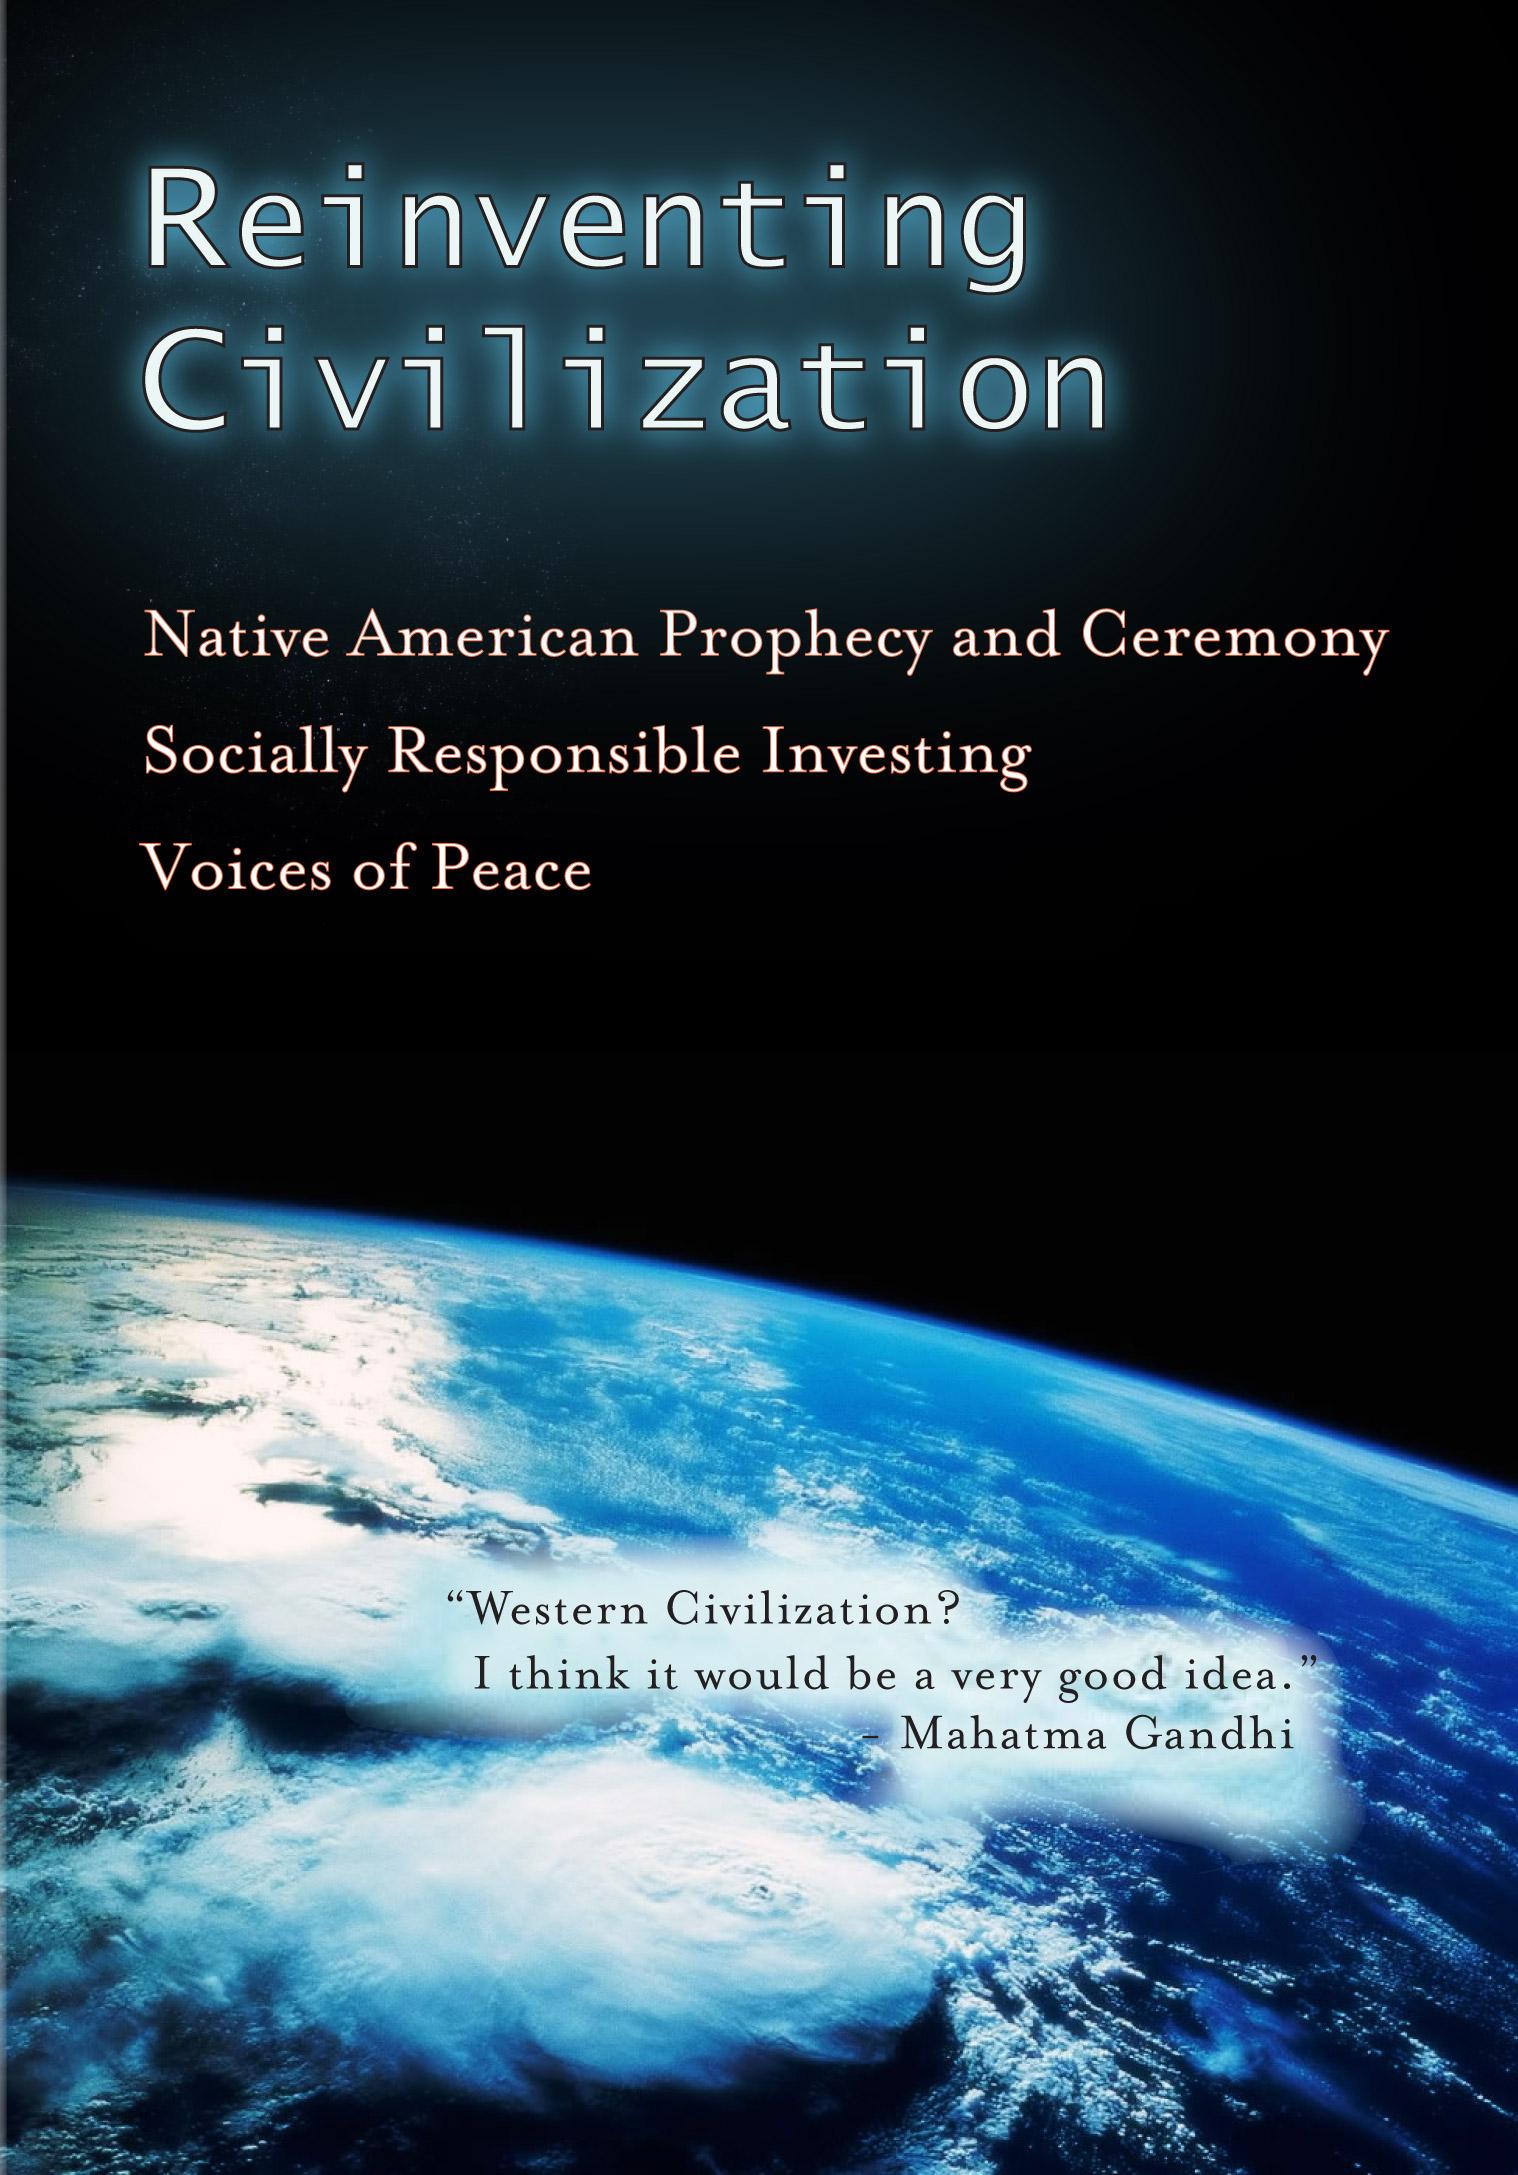 reinventing-civilization-3-in-1